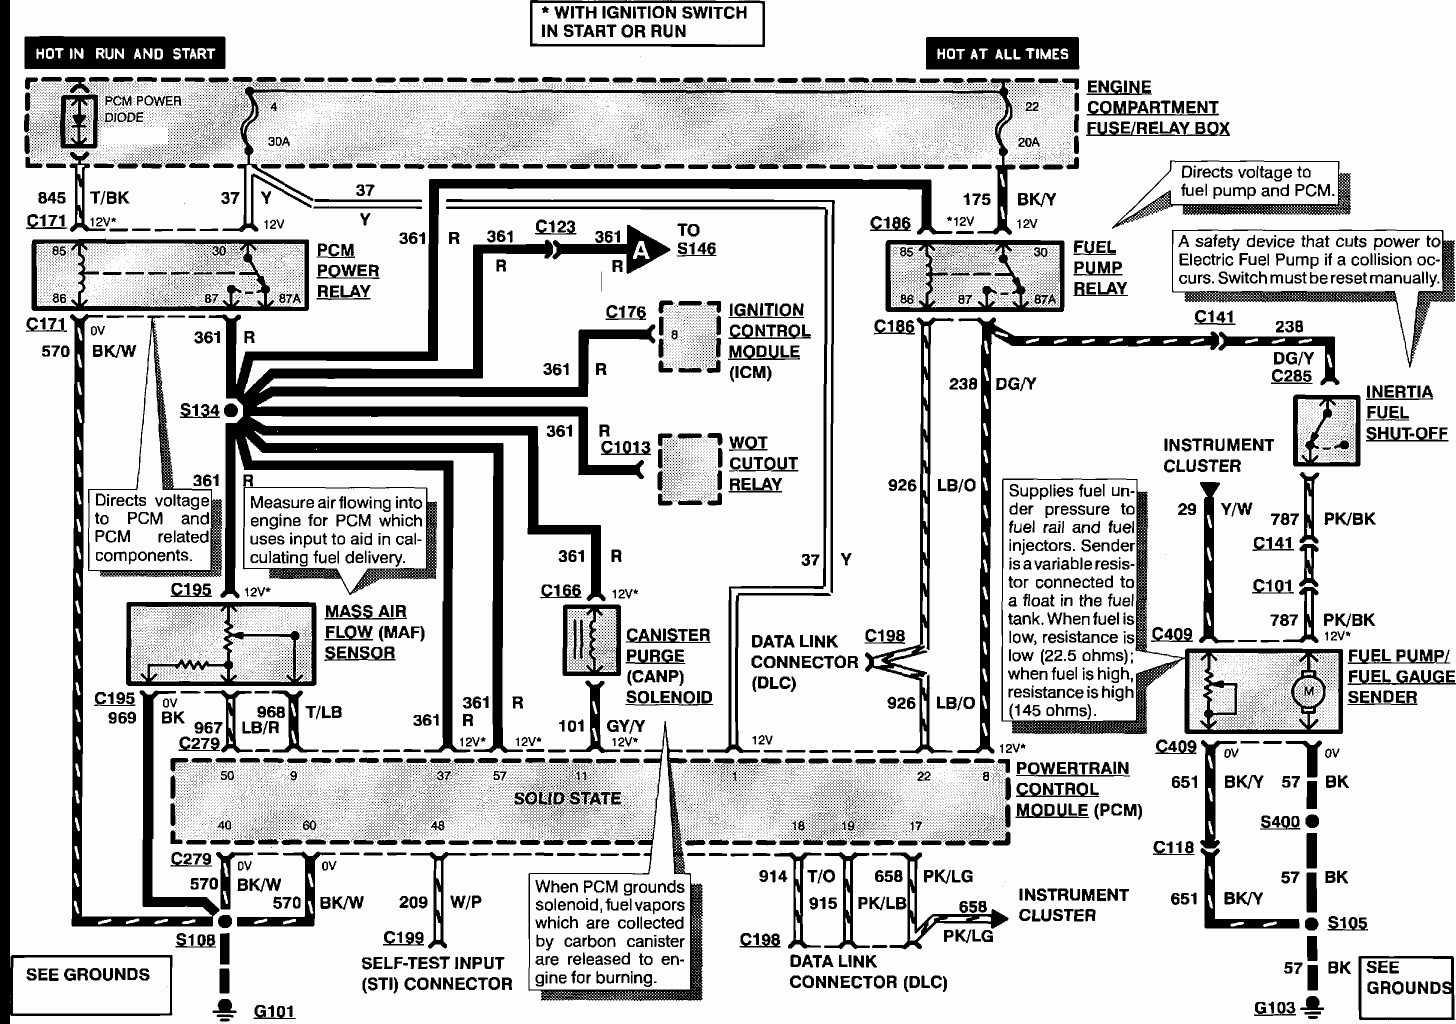 1994 Ford Explorer Xlt Radio Wiring Diagram Trusted Diagrams Land Rover Discovery 94 U2022 Dash 2004 Cobra